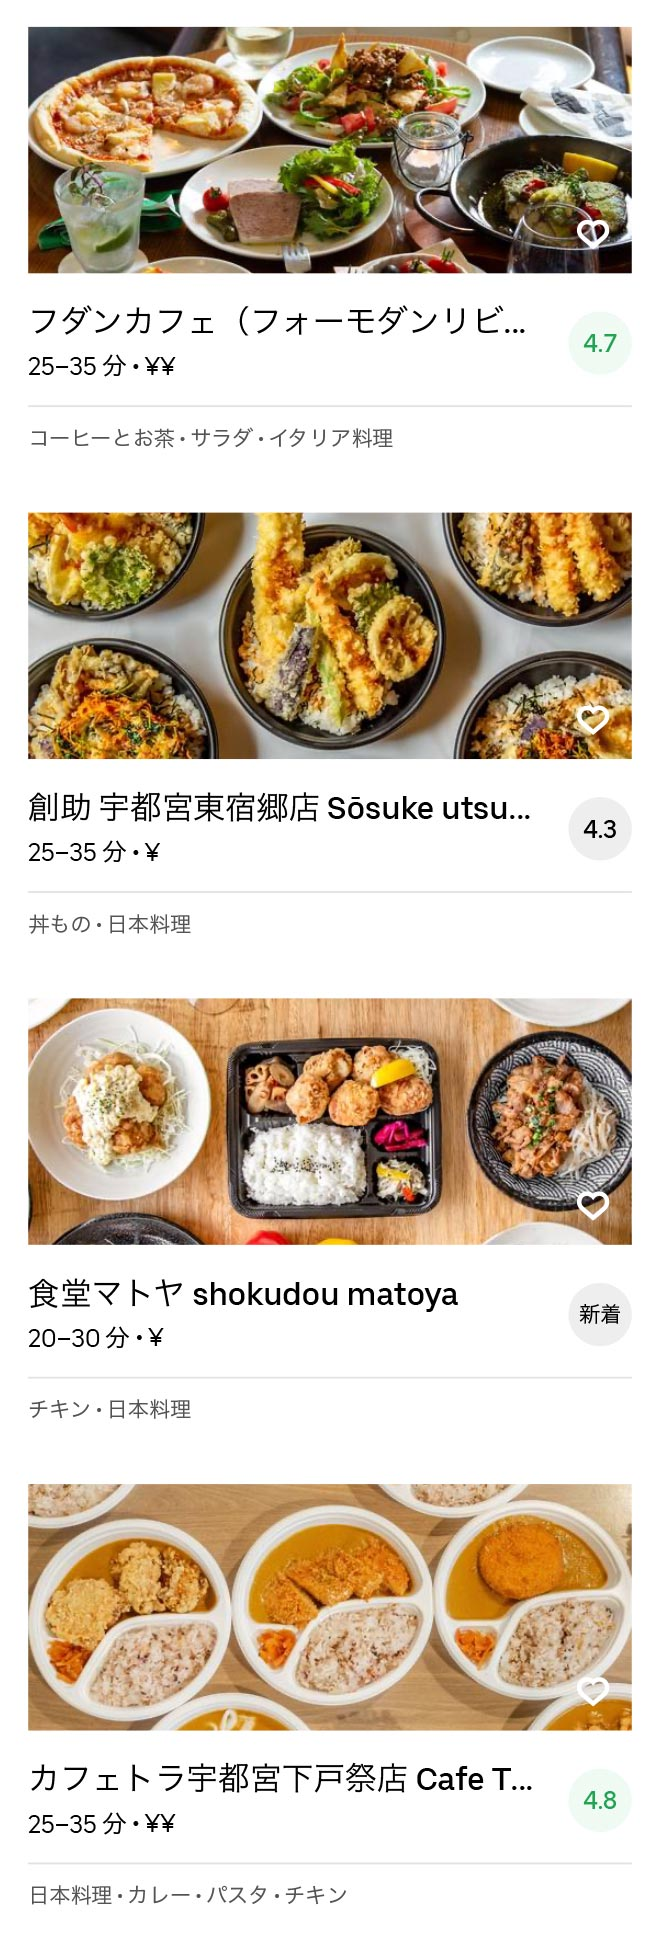 Utsunomiya menu 200606